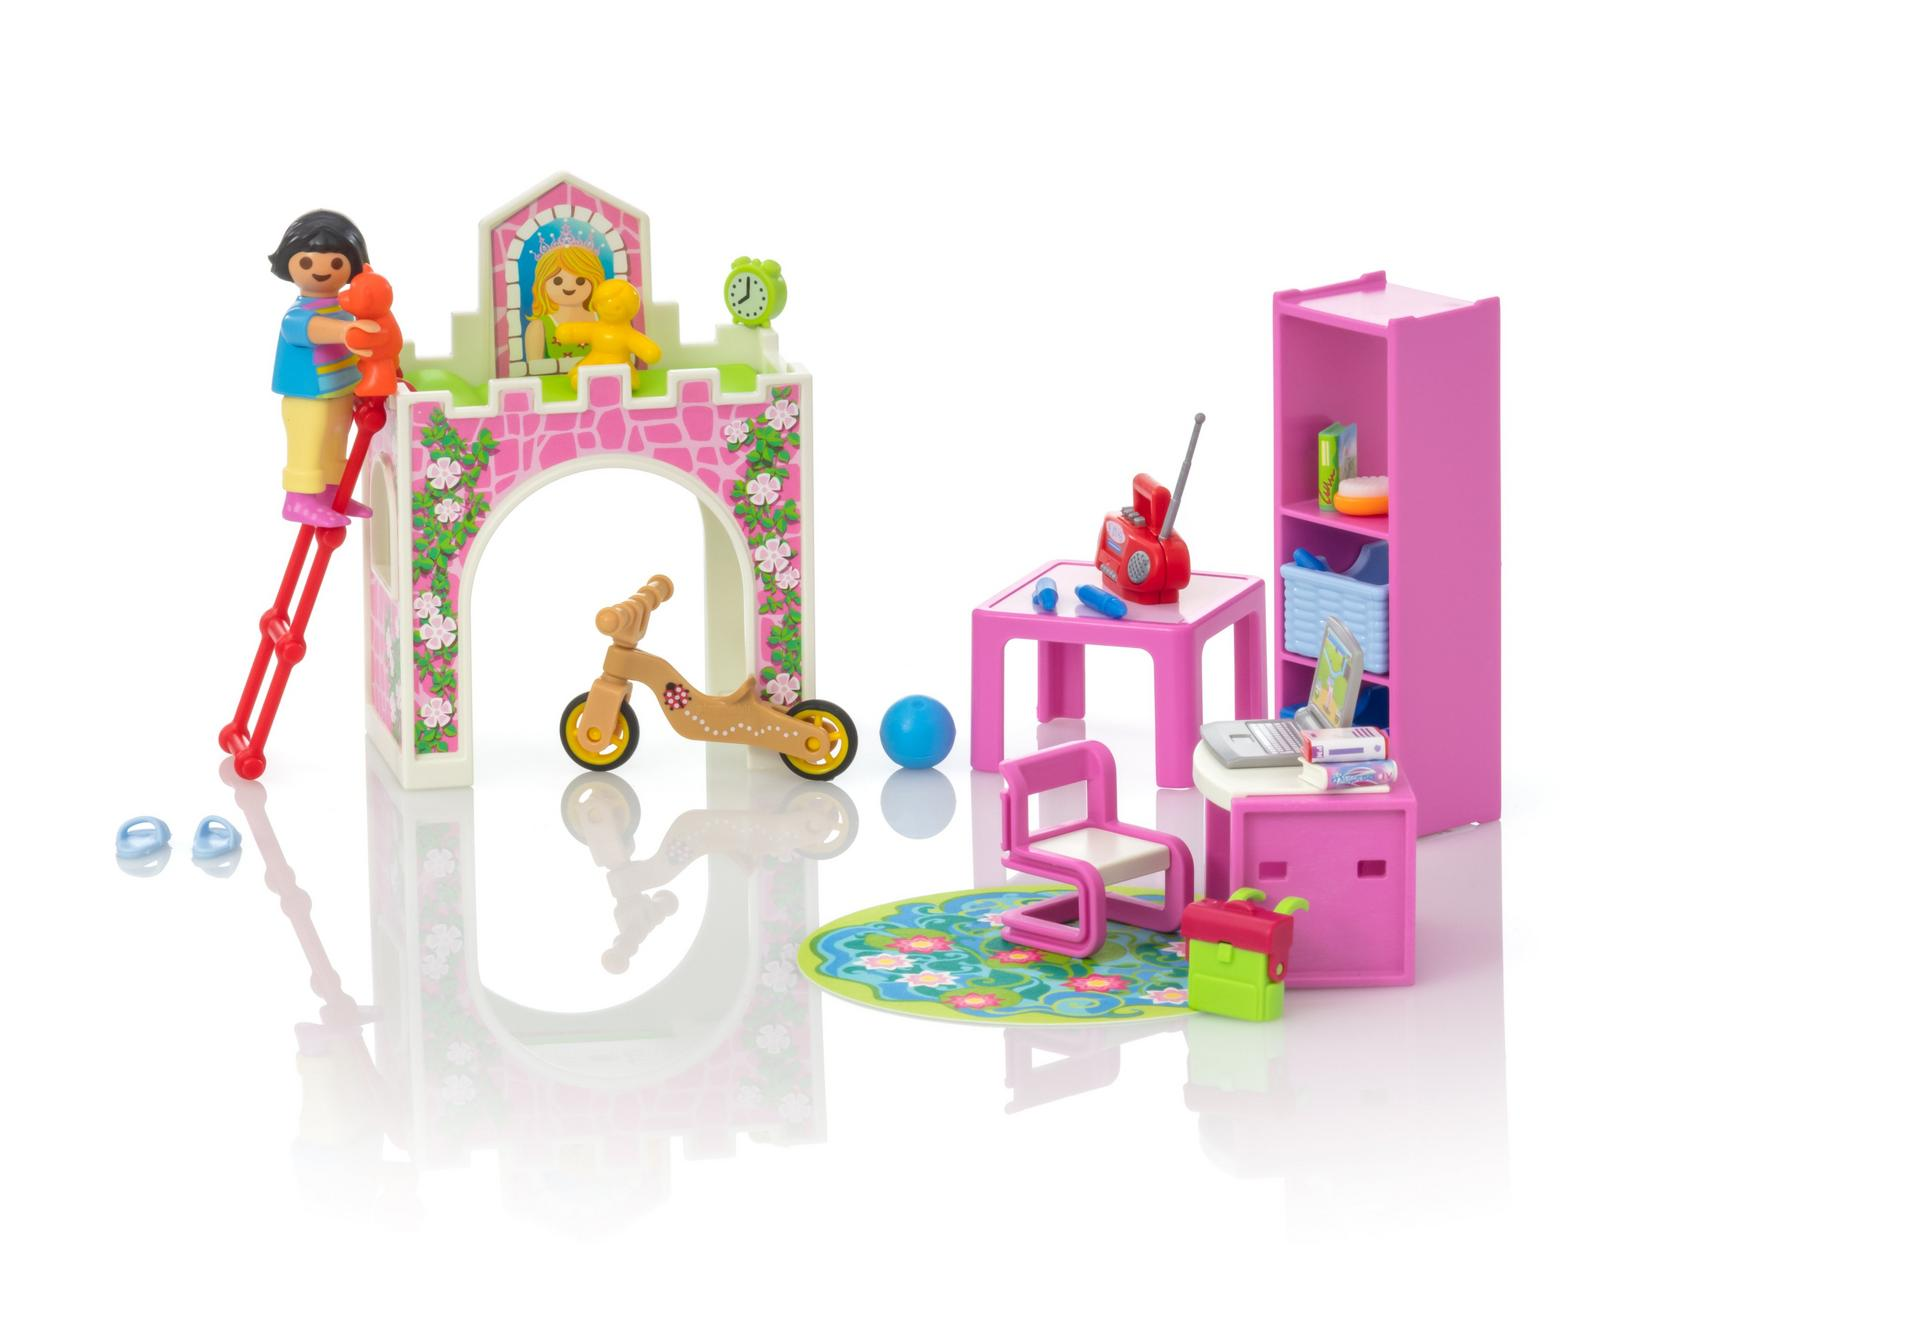 Ausmalbilder Playmobil Villa : Atemberaubend Playmobil Luxusvilla Kinderzimmer Ideen